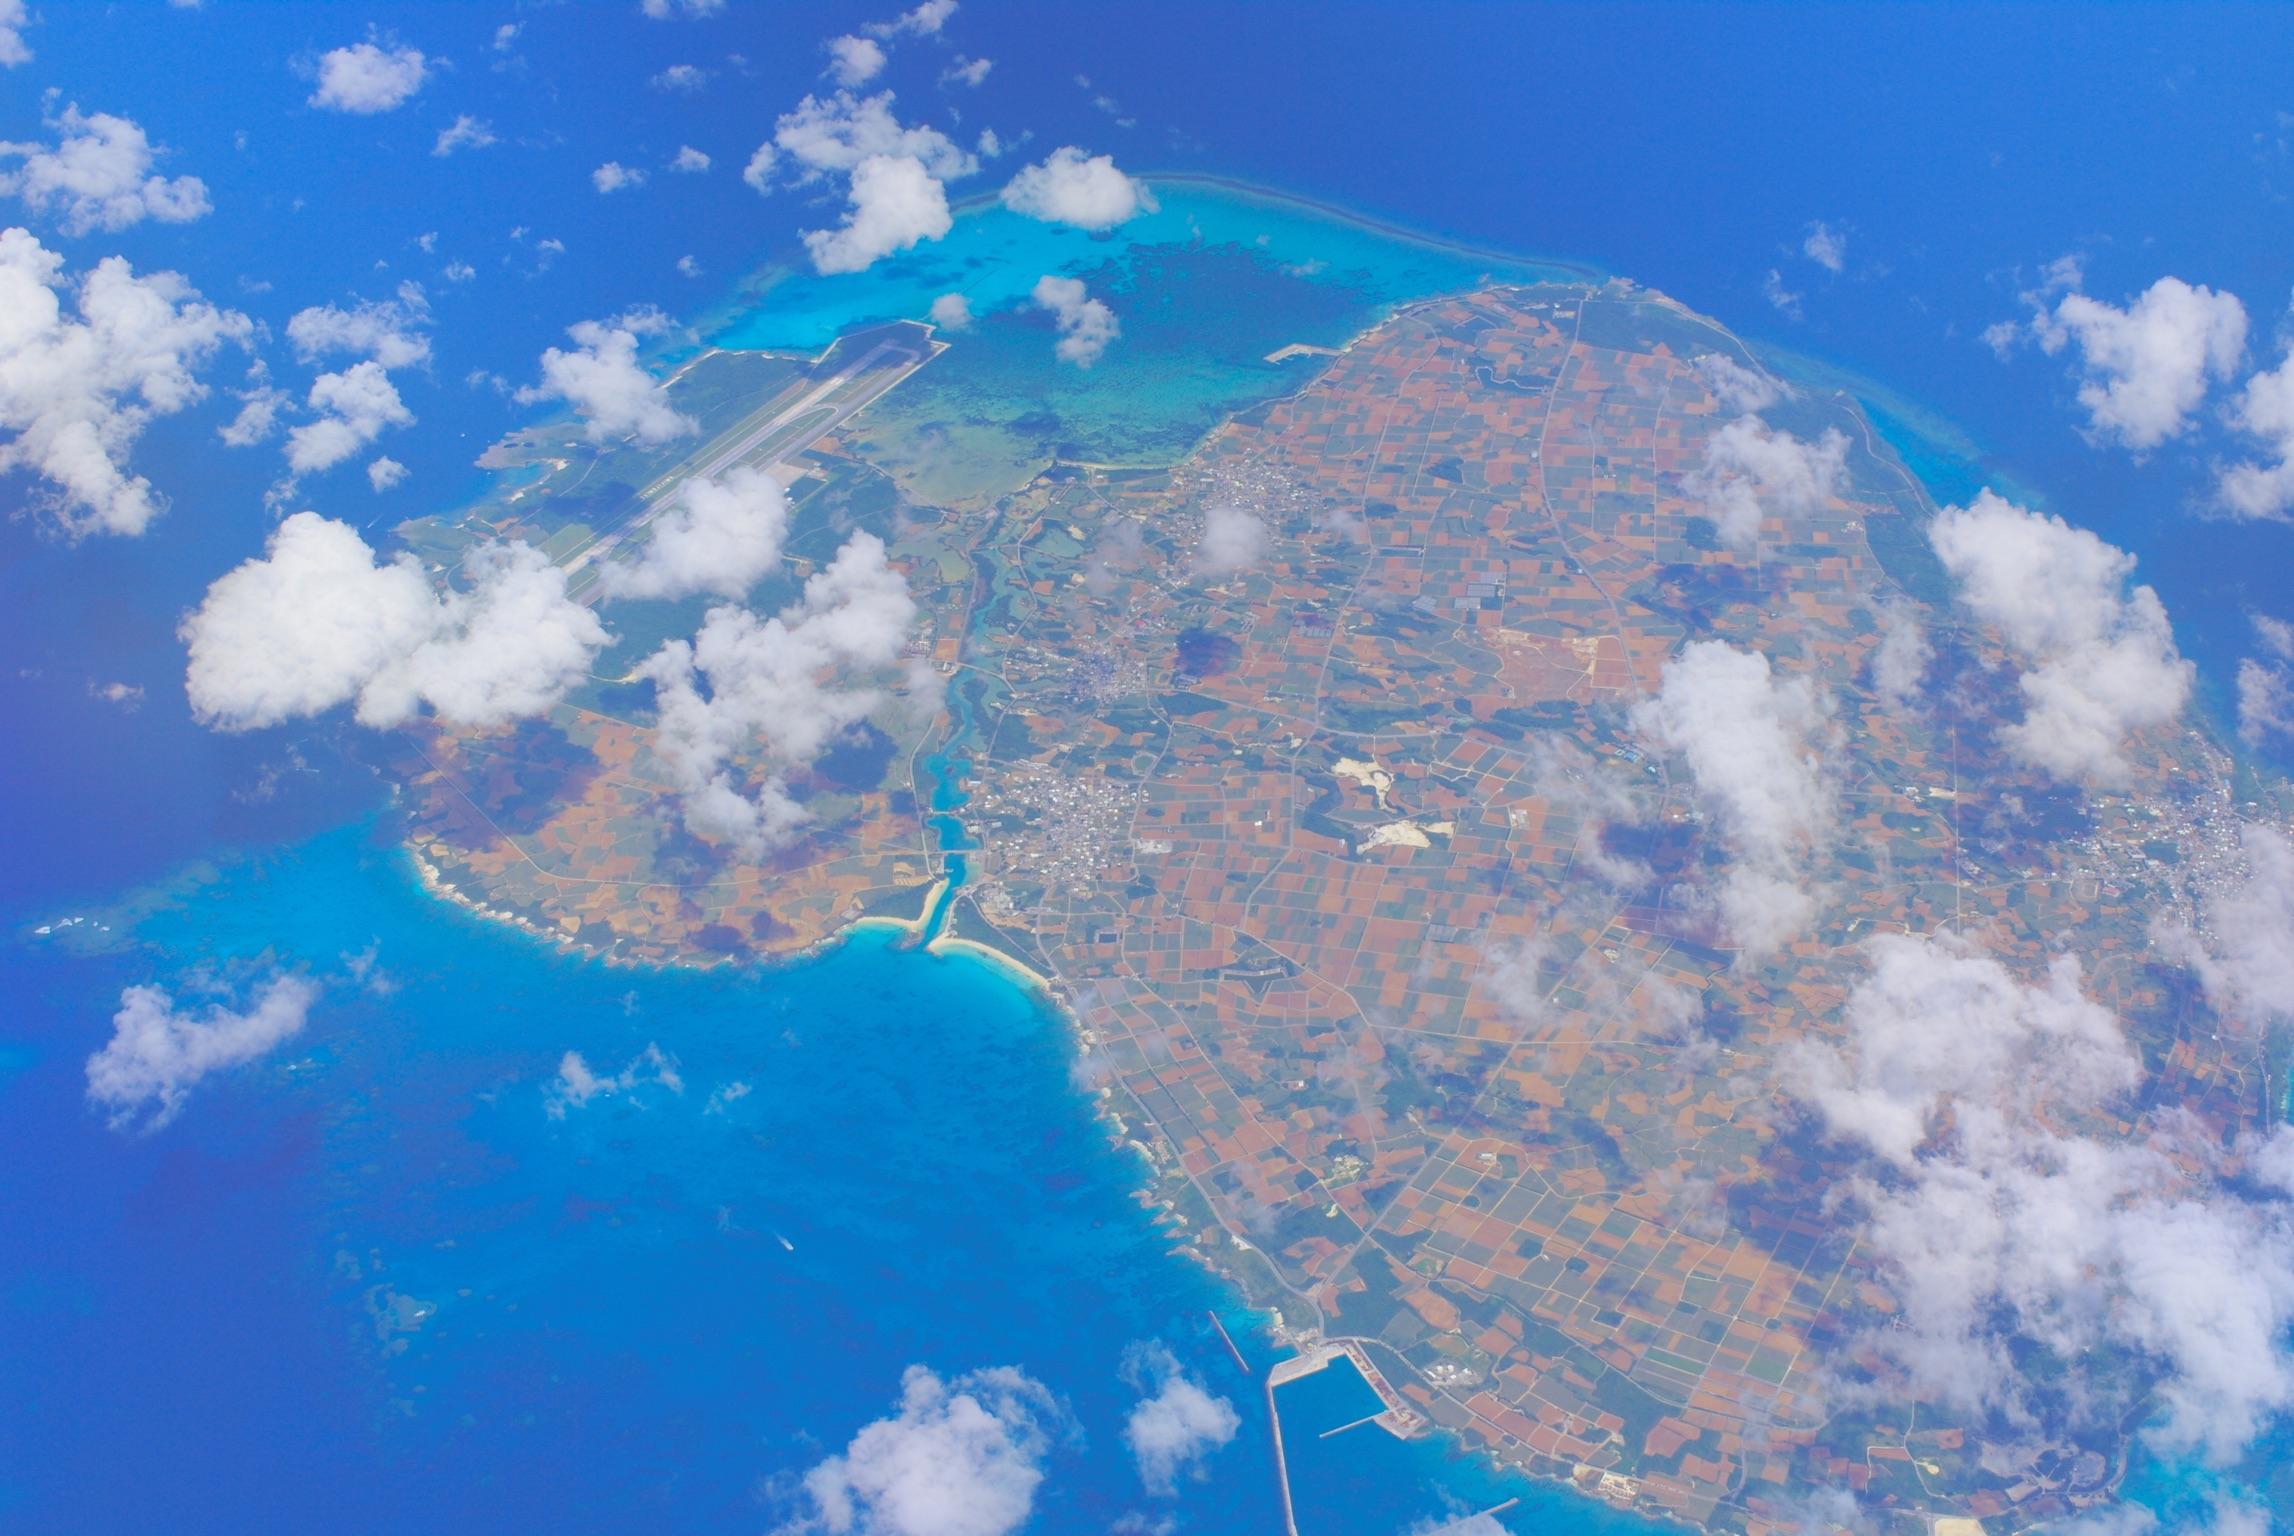 伊良部島の全景